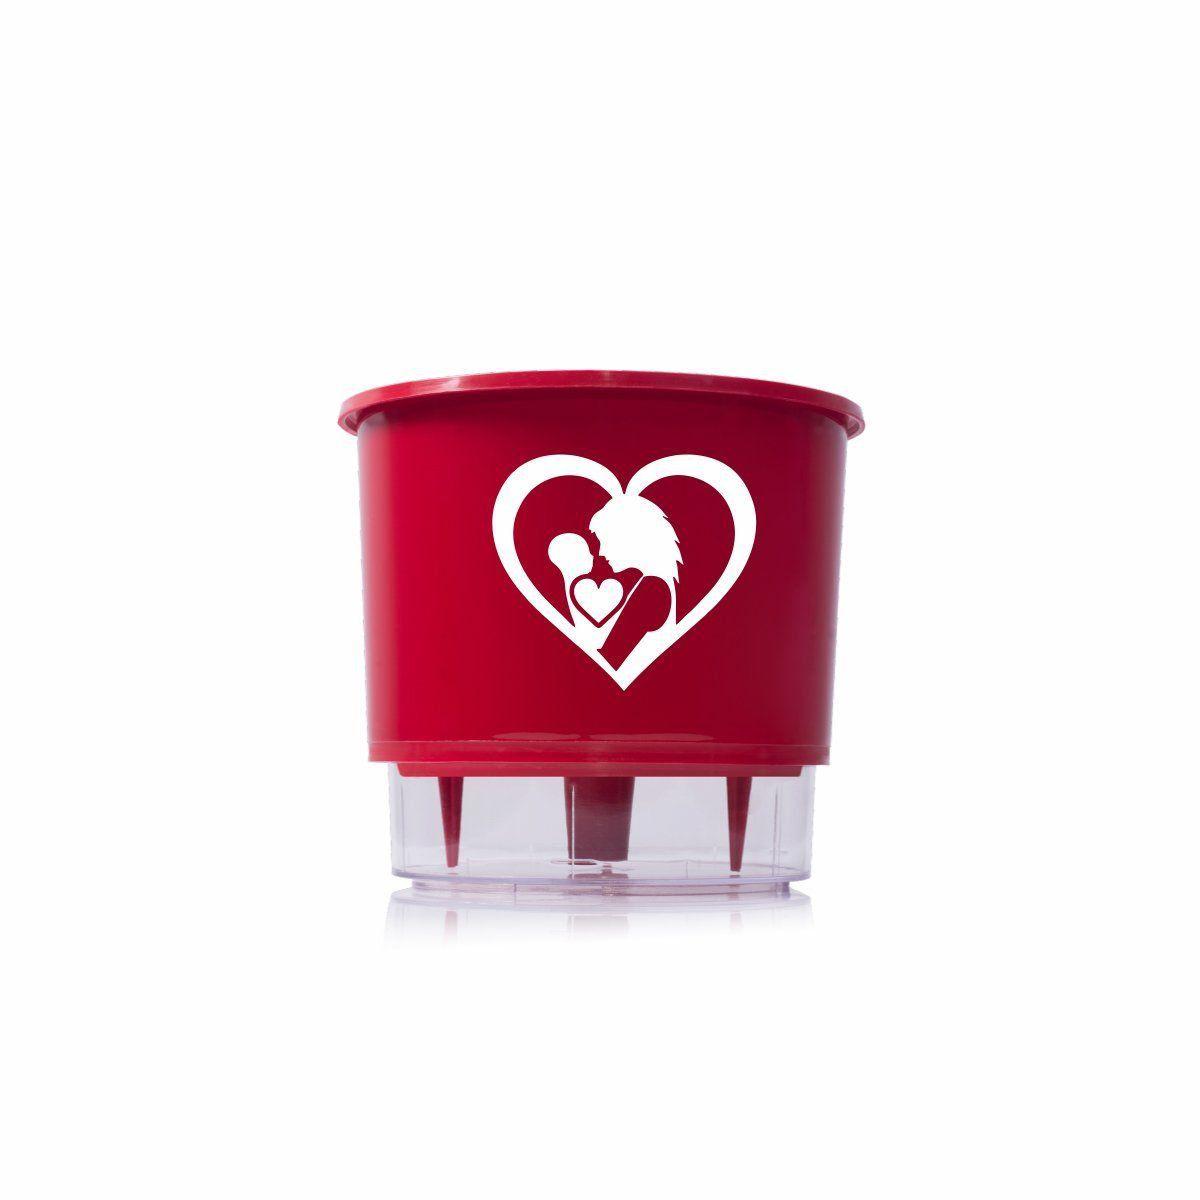 Vaso Autoirrigável Médio N03 Vermelho Amor de Mãe 16cm x 14cm